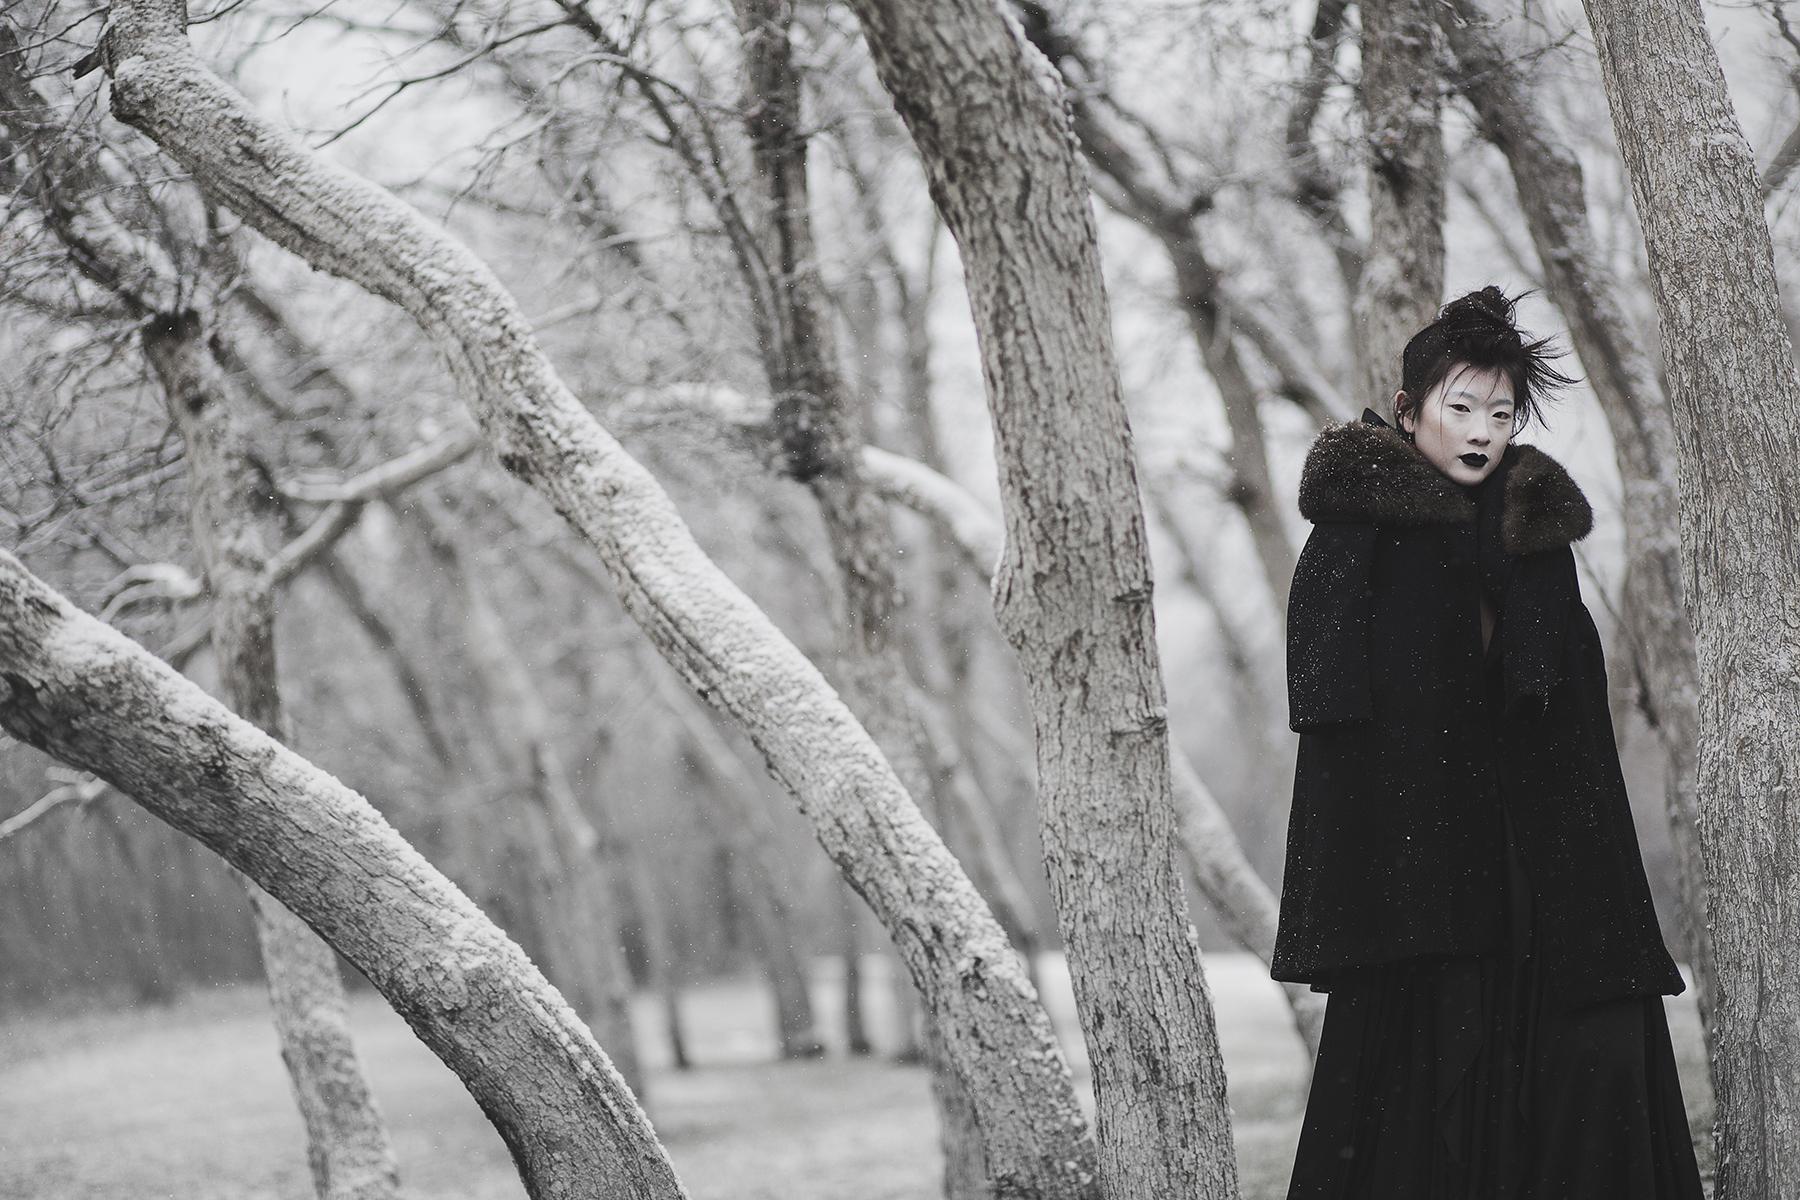 © duston todd_fashion_asian_trees_coat_snow_003.jpg